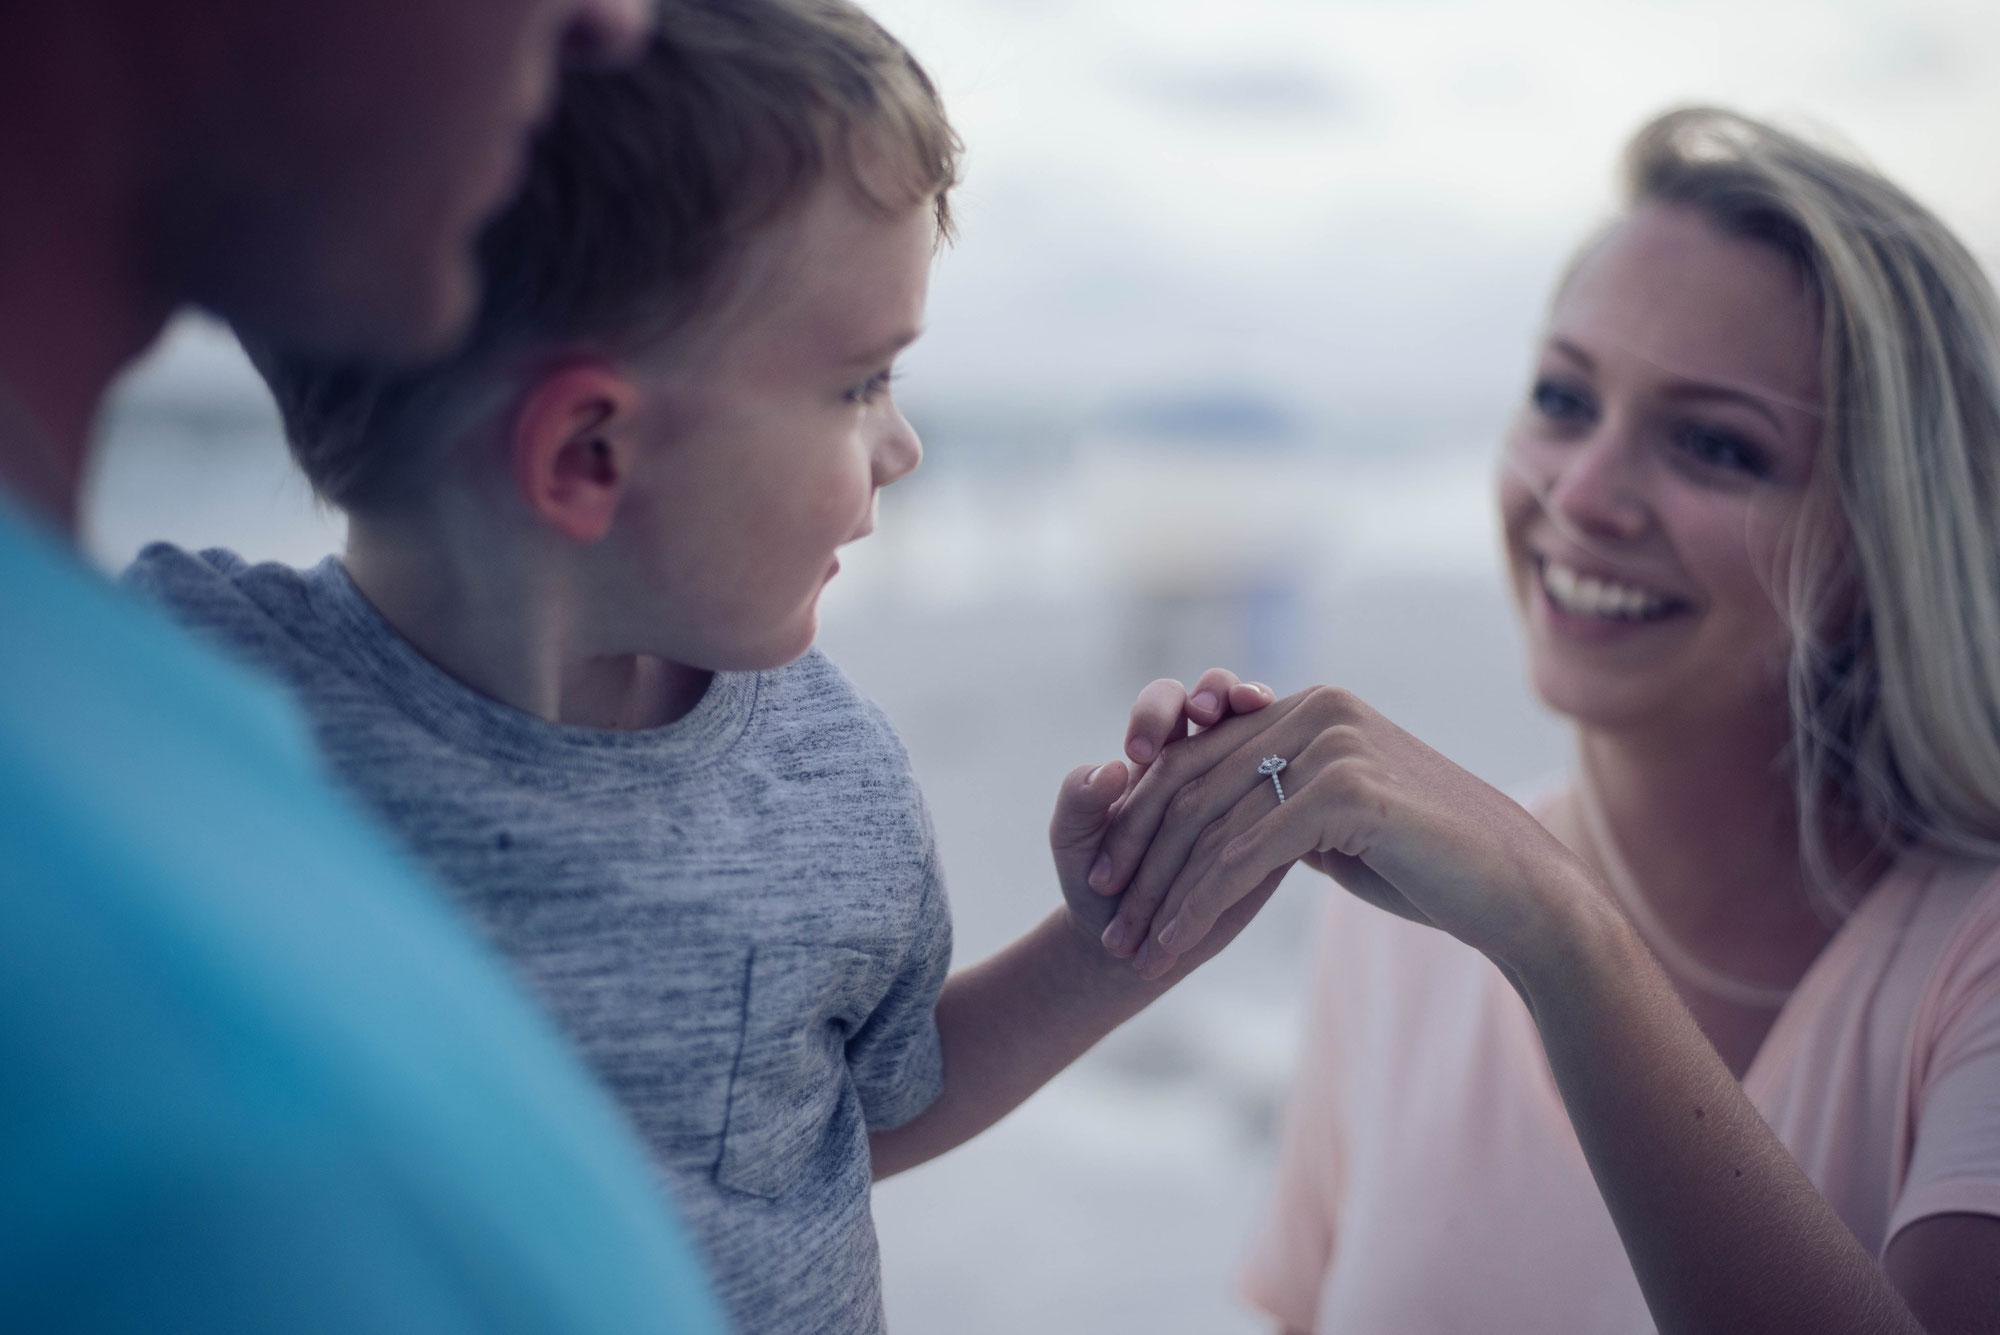 Adoption 3 - Stiefkindadoption